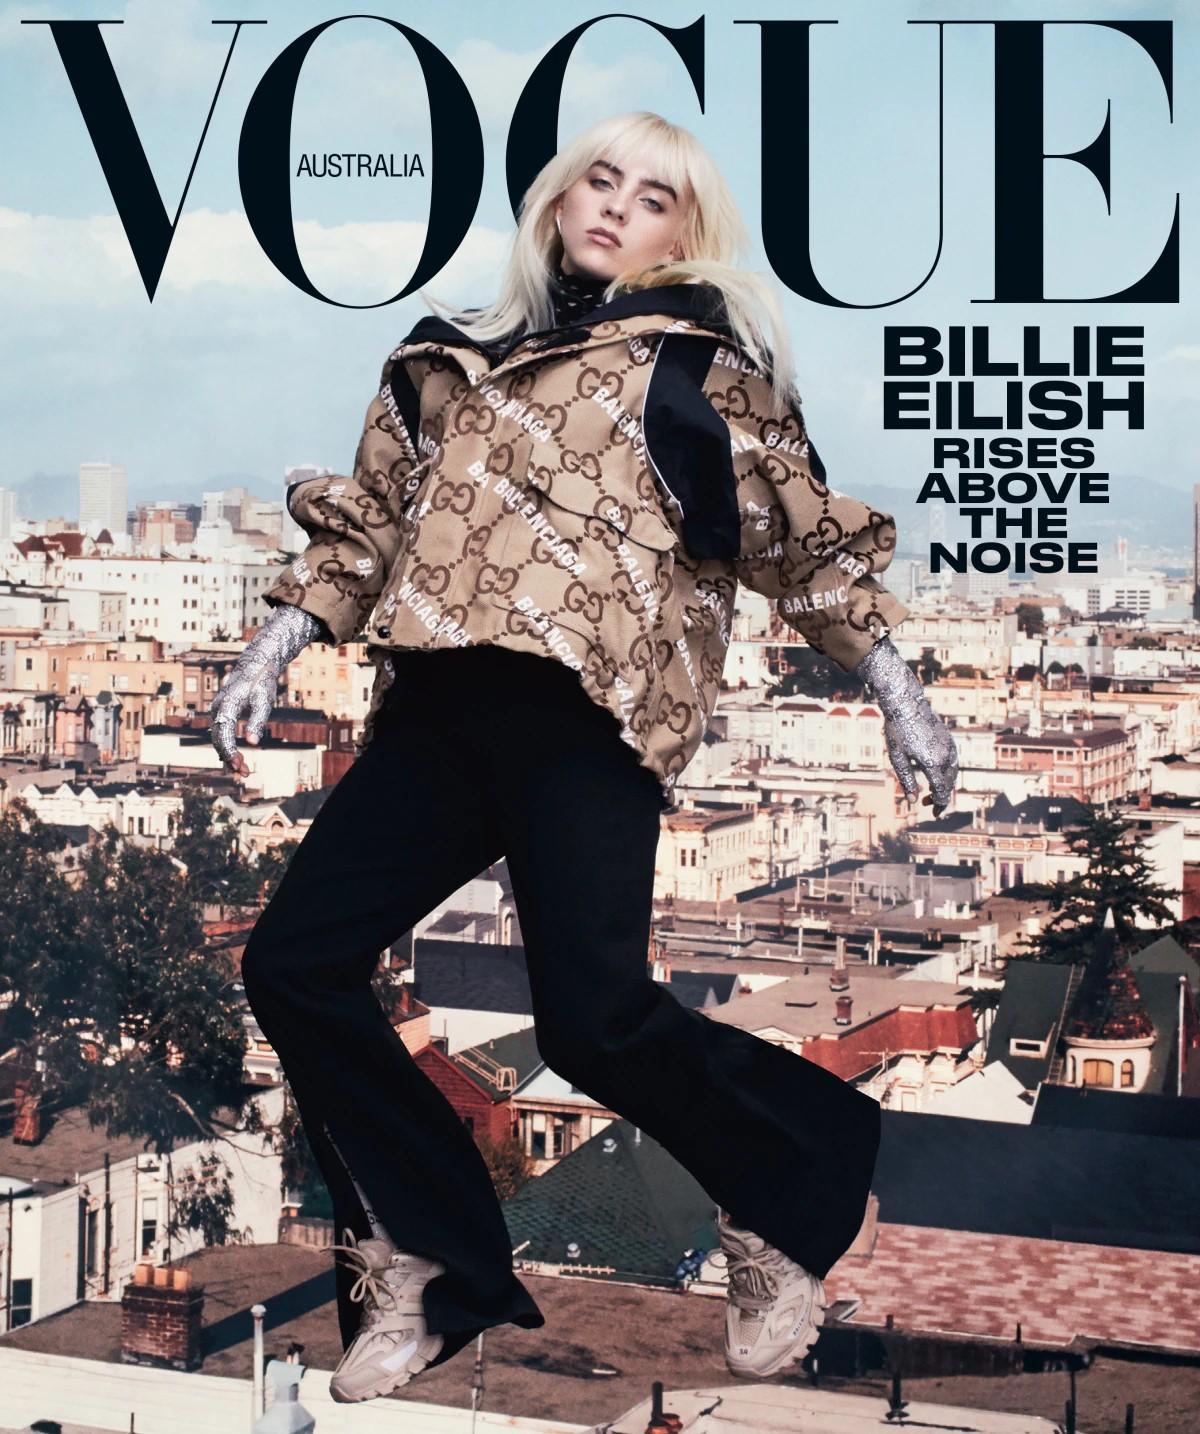 Billie Eilish covers Vogue Australia August 2021 by Emma Summerton